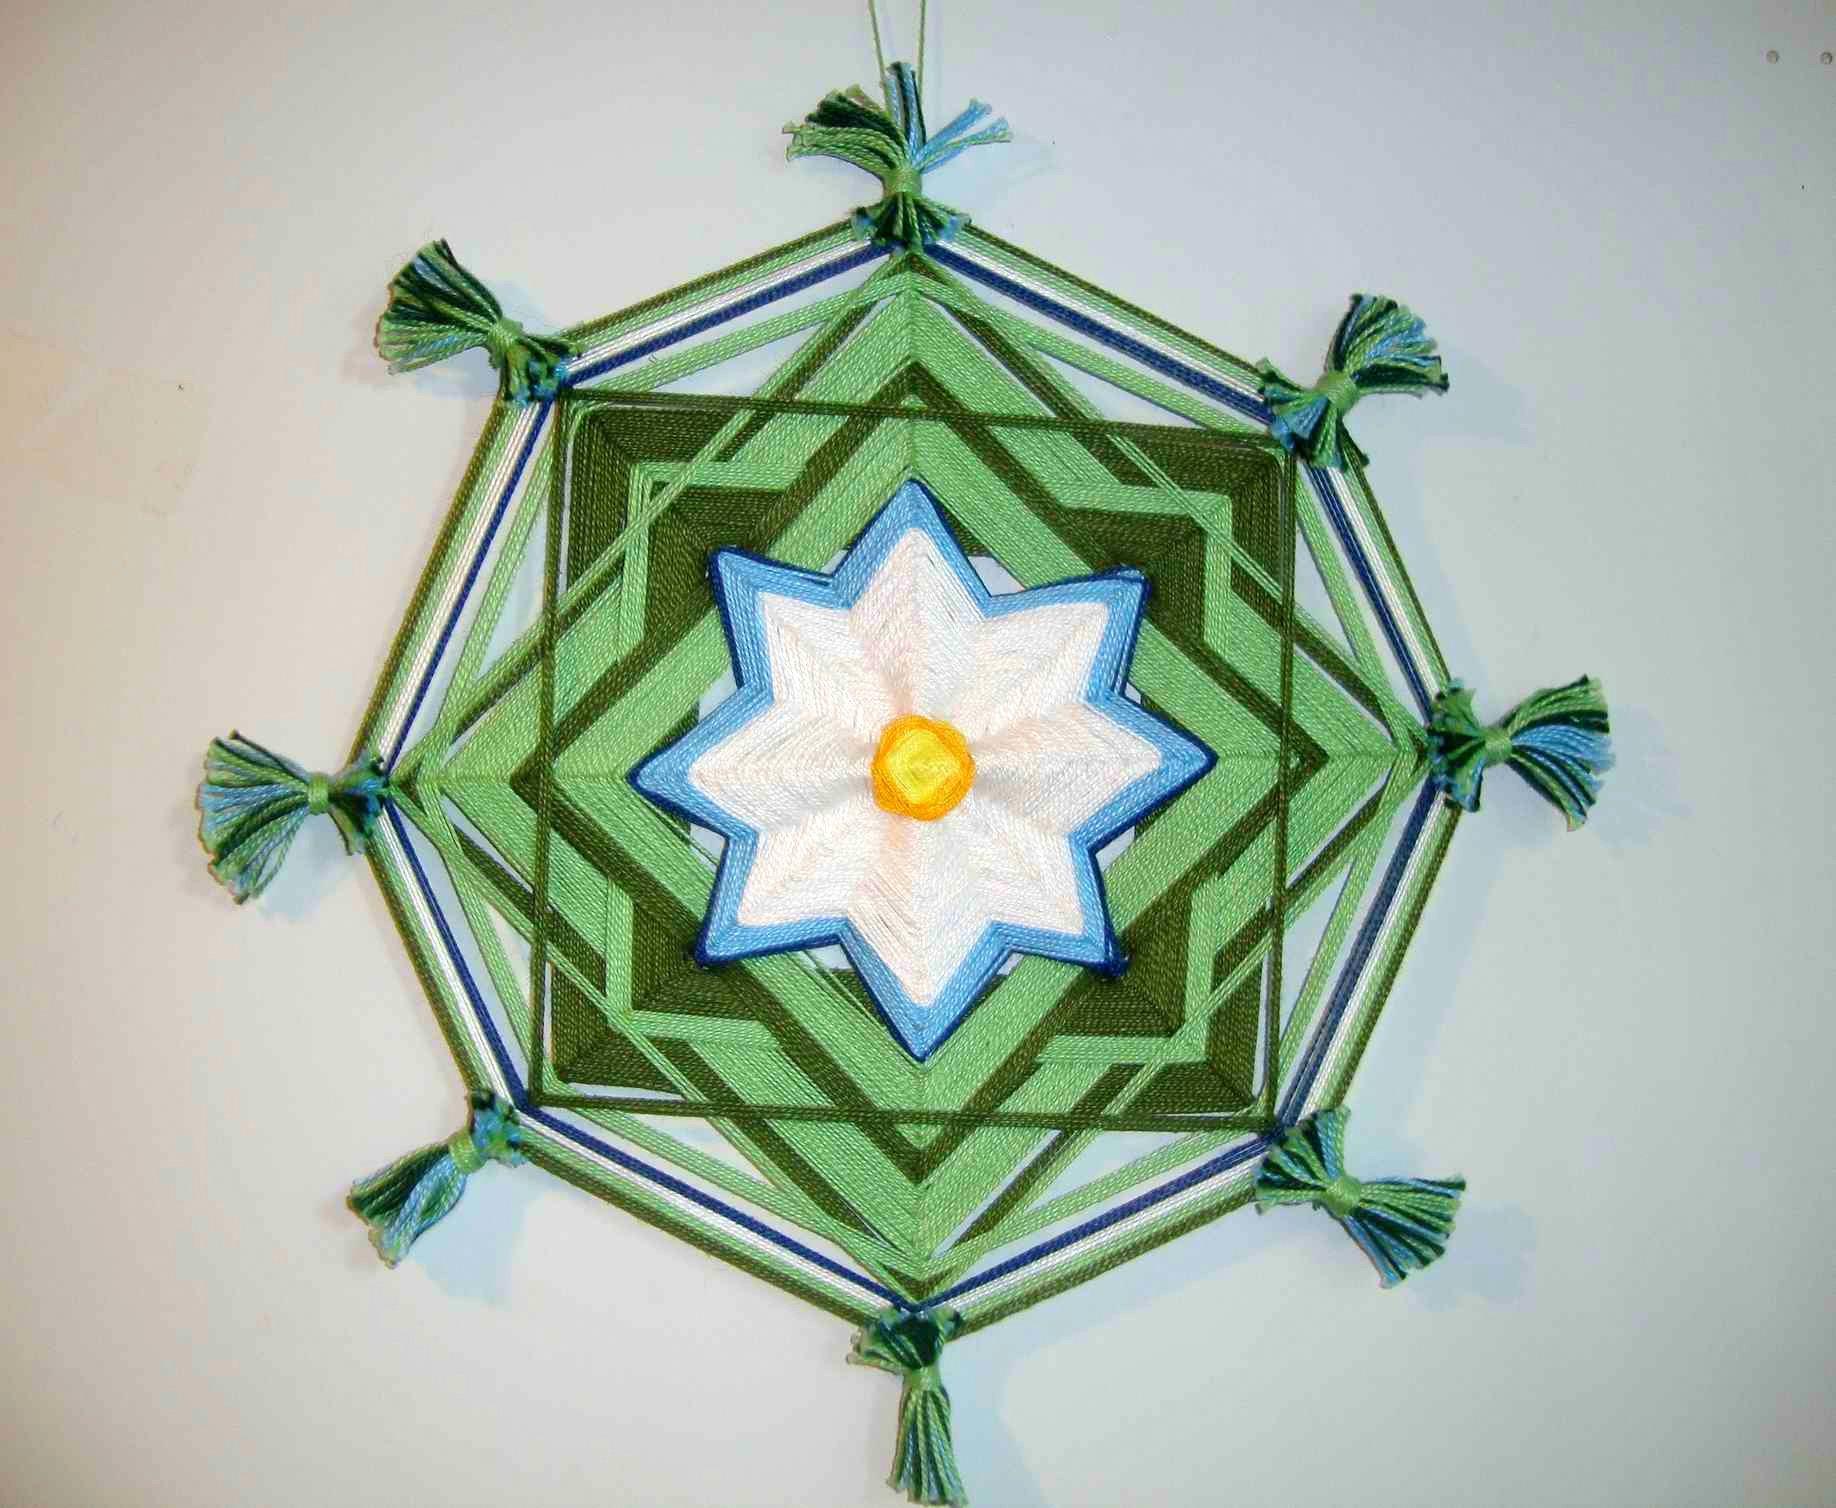 Плетение мандал - творческий мастер-класс в Москве Чайно-Творческая Мастерская